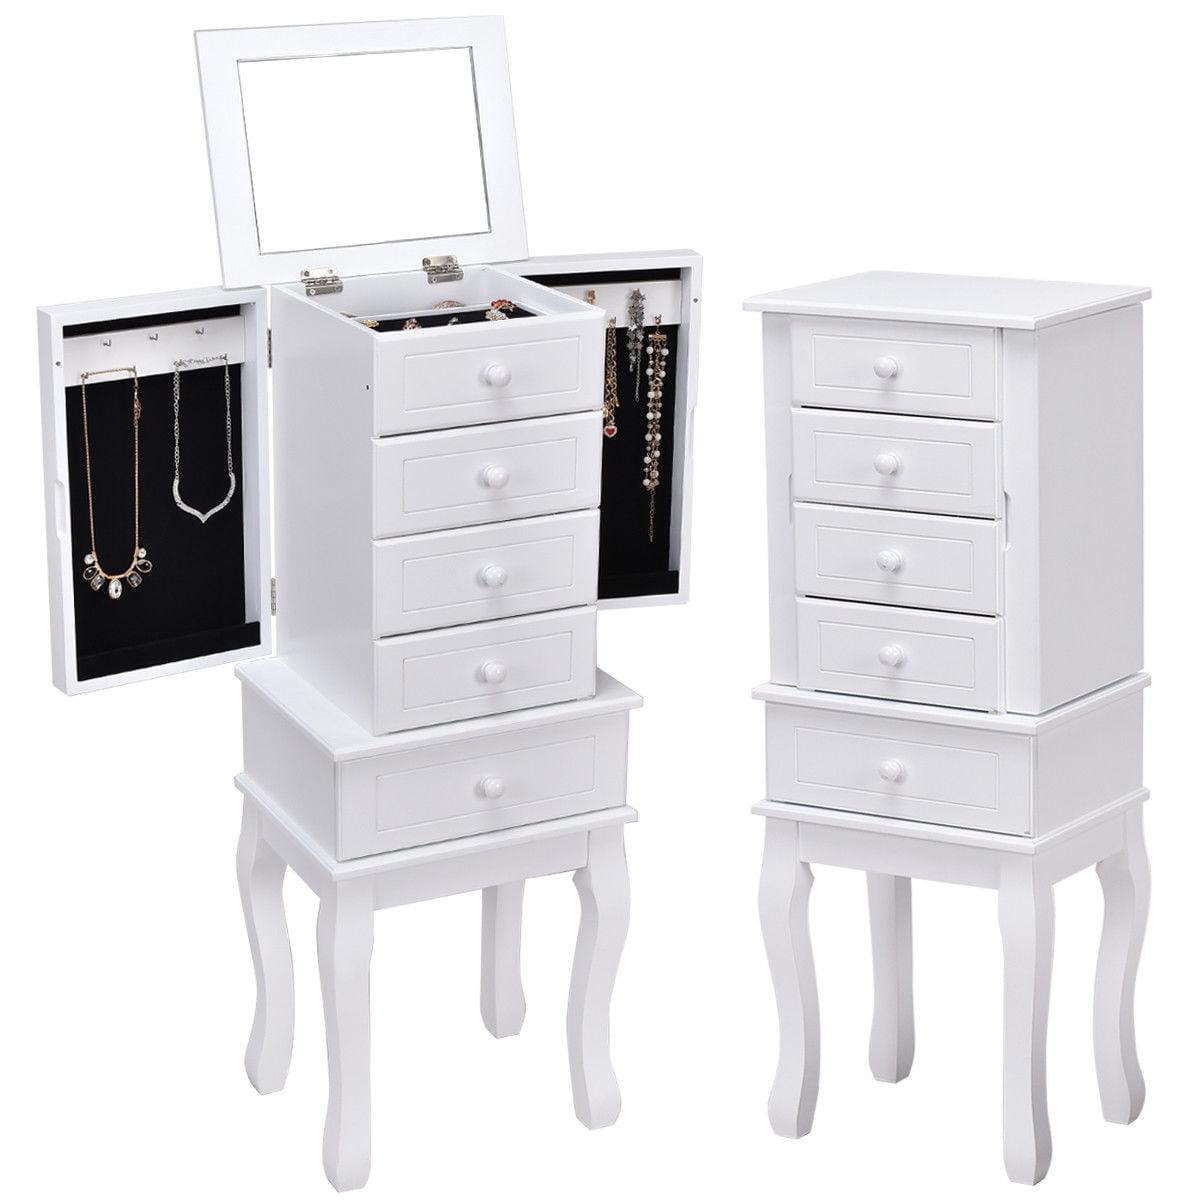 Gymax Jewelry Cabinet Armoire Box Mirrored Storage Chest Stand Organizer